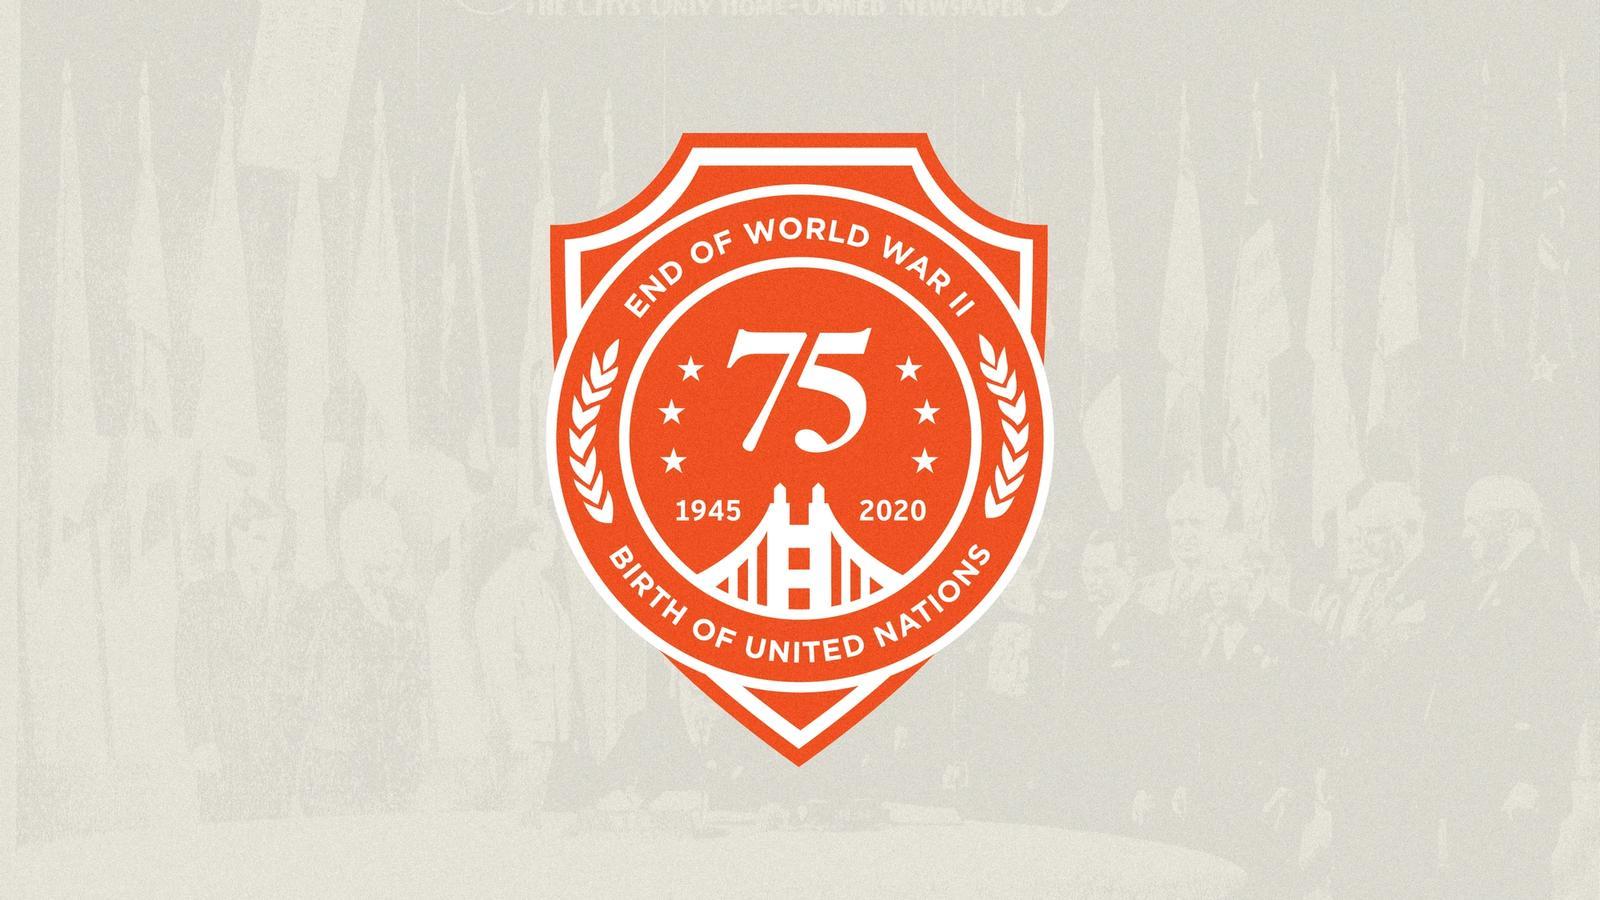 75th Anniversary: End of WWII & Birth of UN // Logo